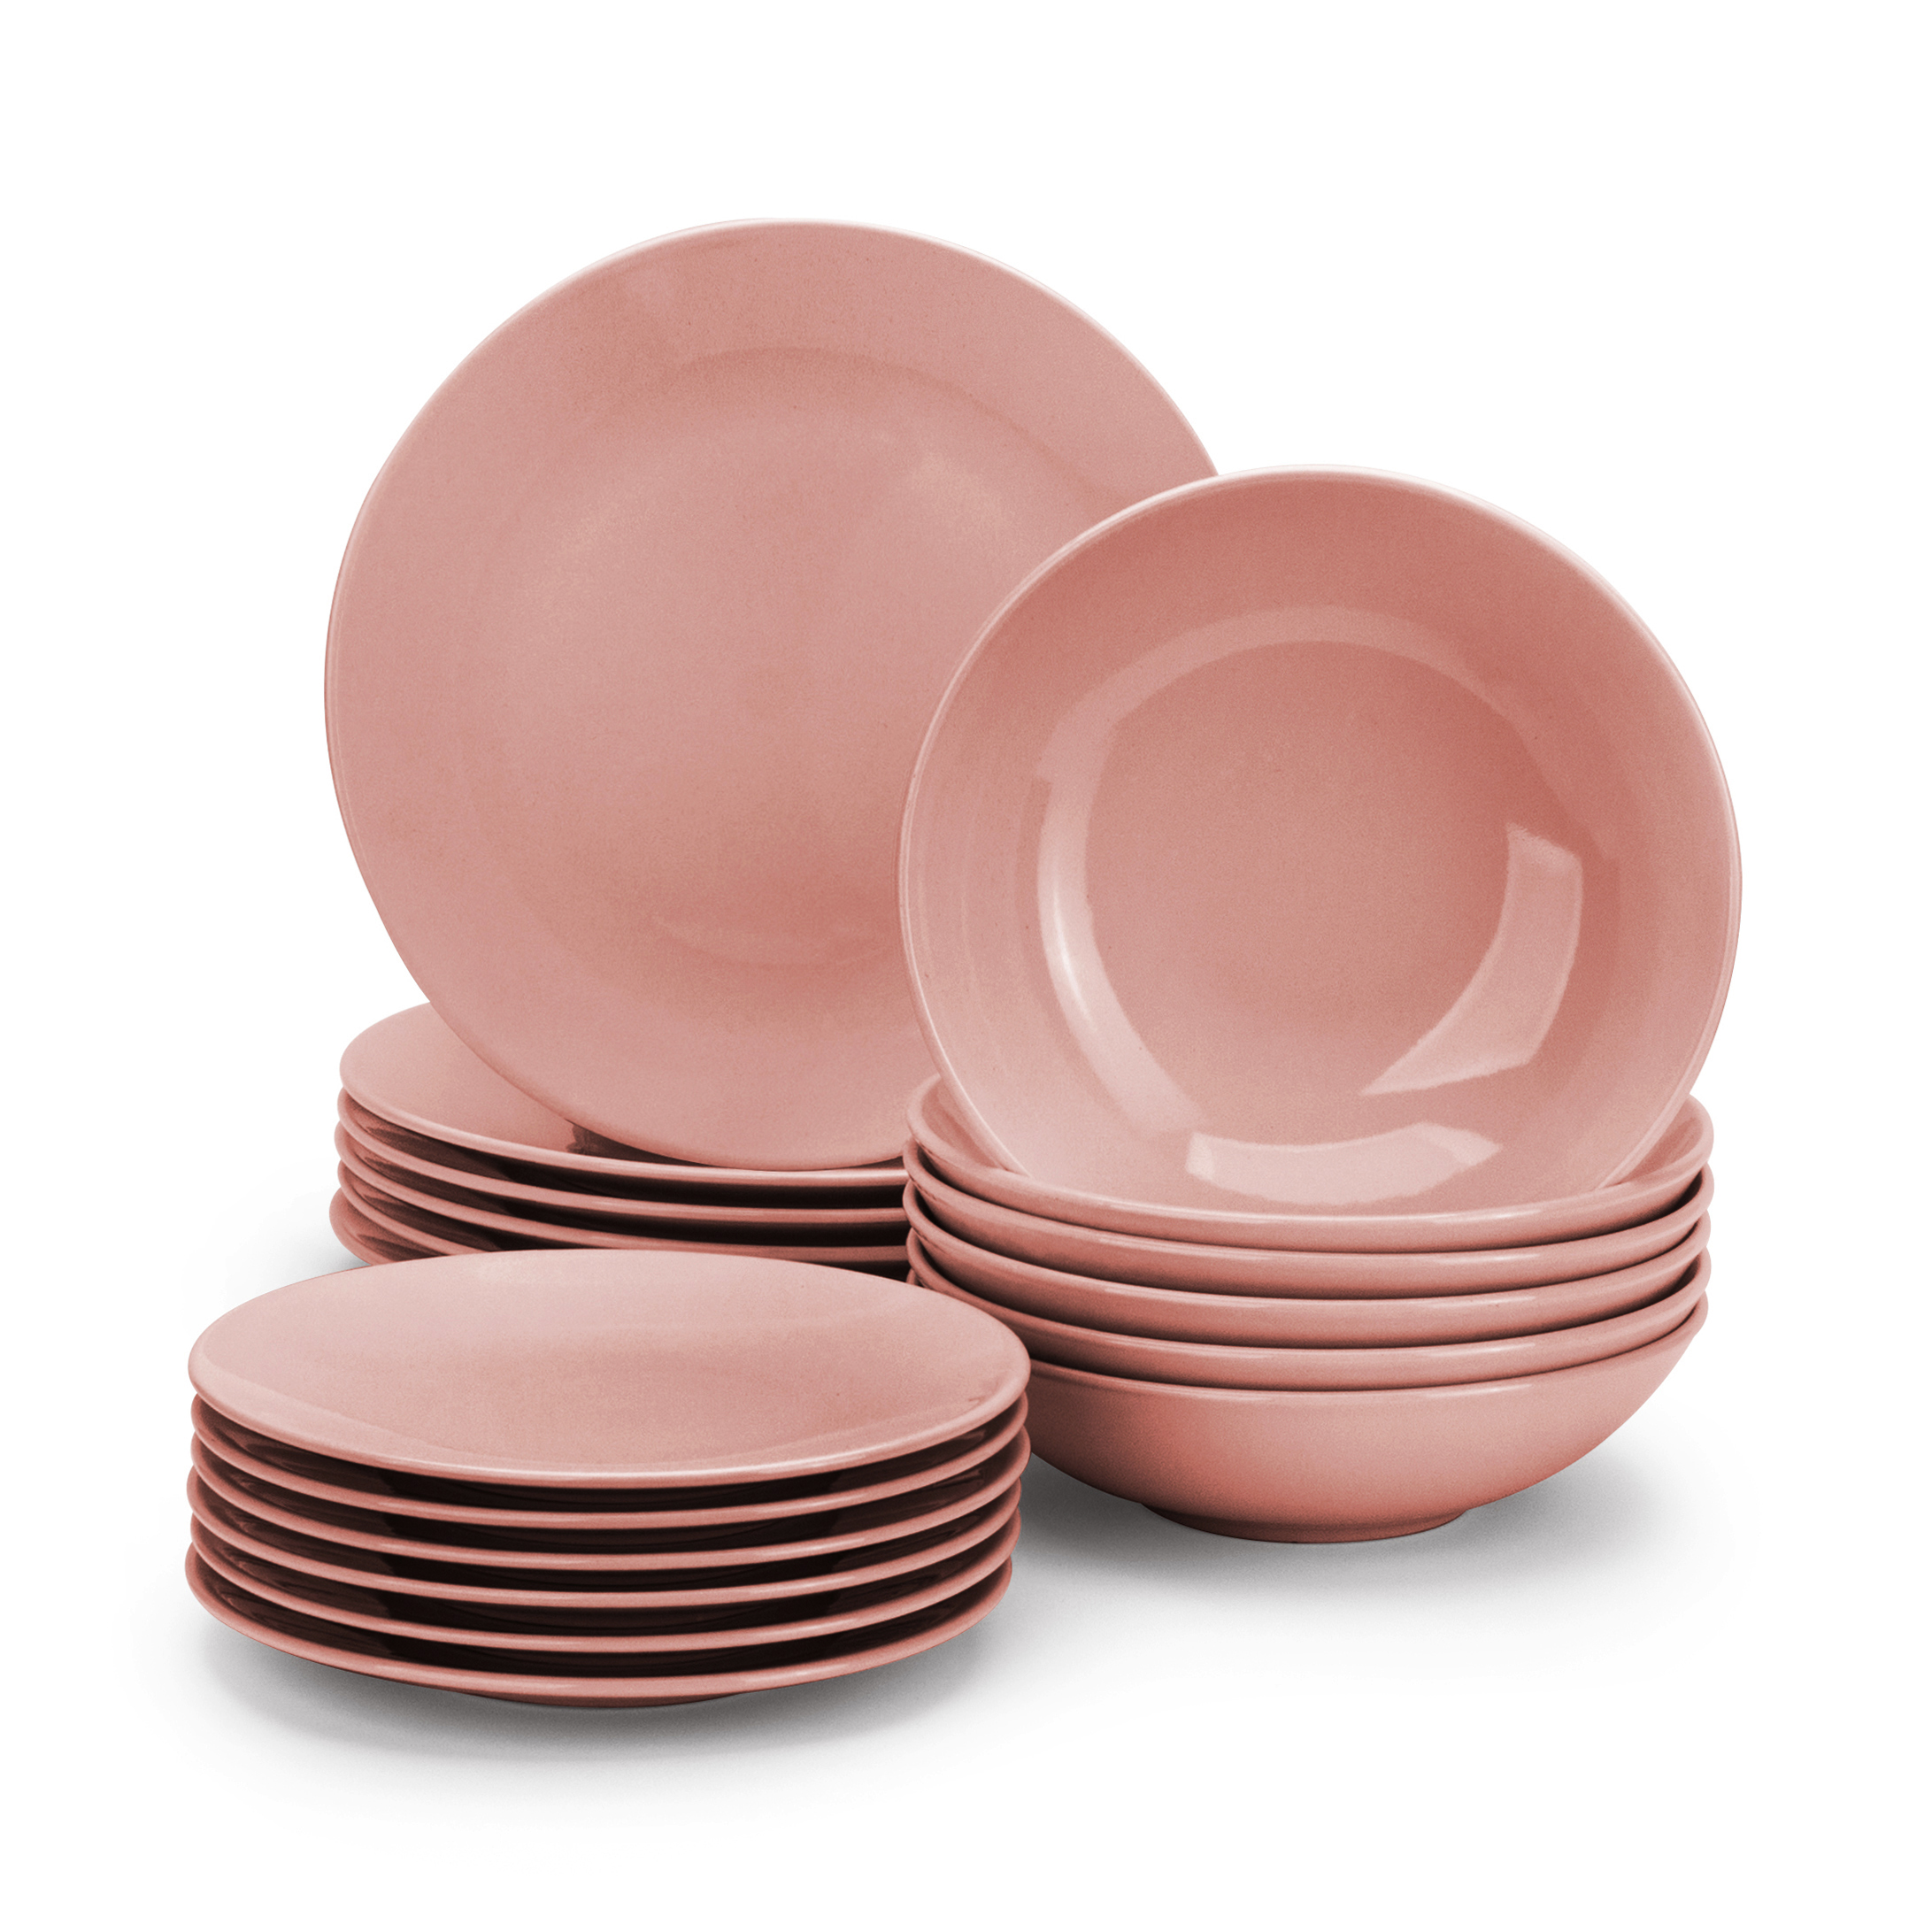 tafelservice 6 personen 18 tlg keramik geschirr set kombiservice rosa modern ebay. Black Bedroom Furniture Sets. Home Design Ideas